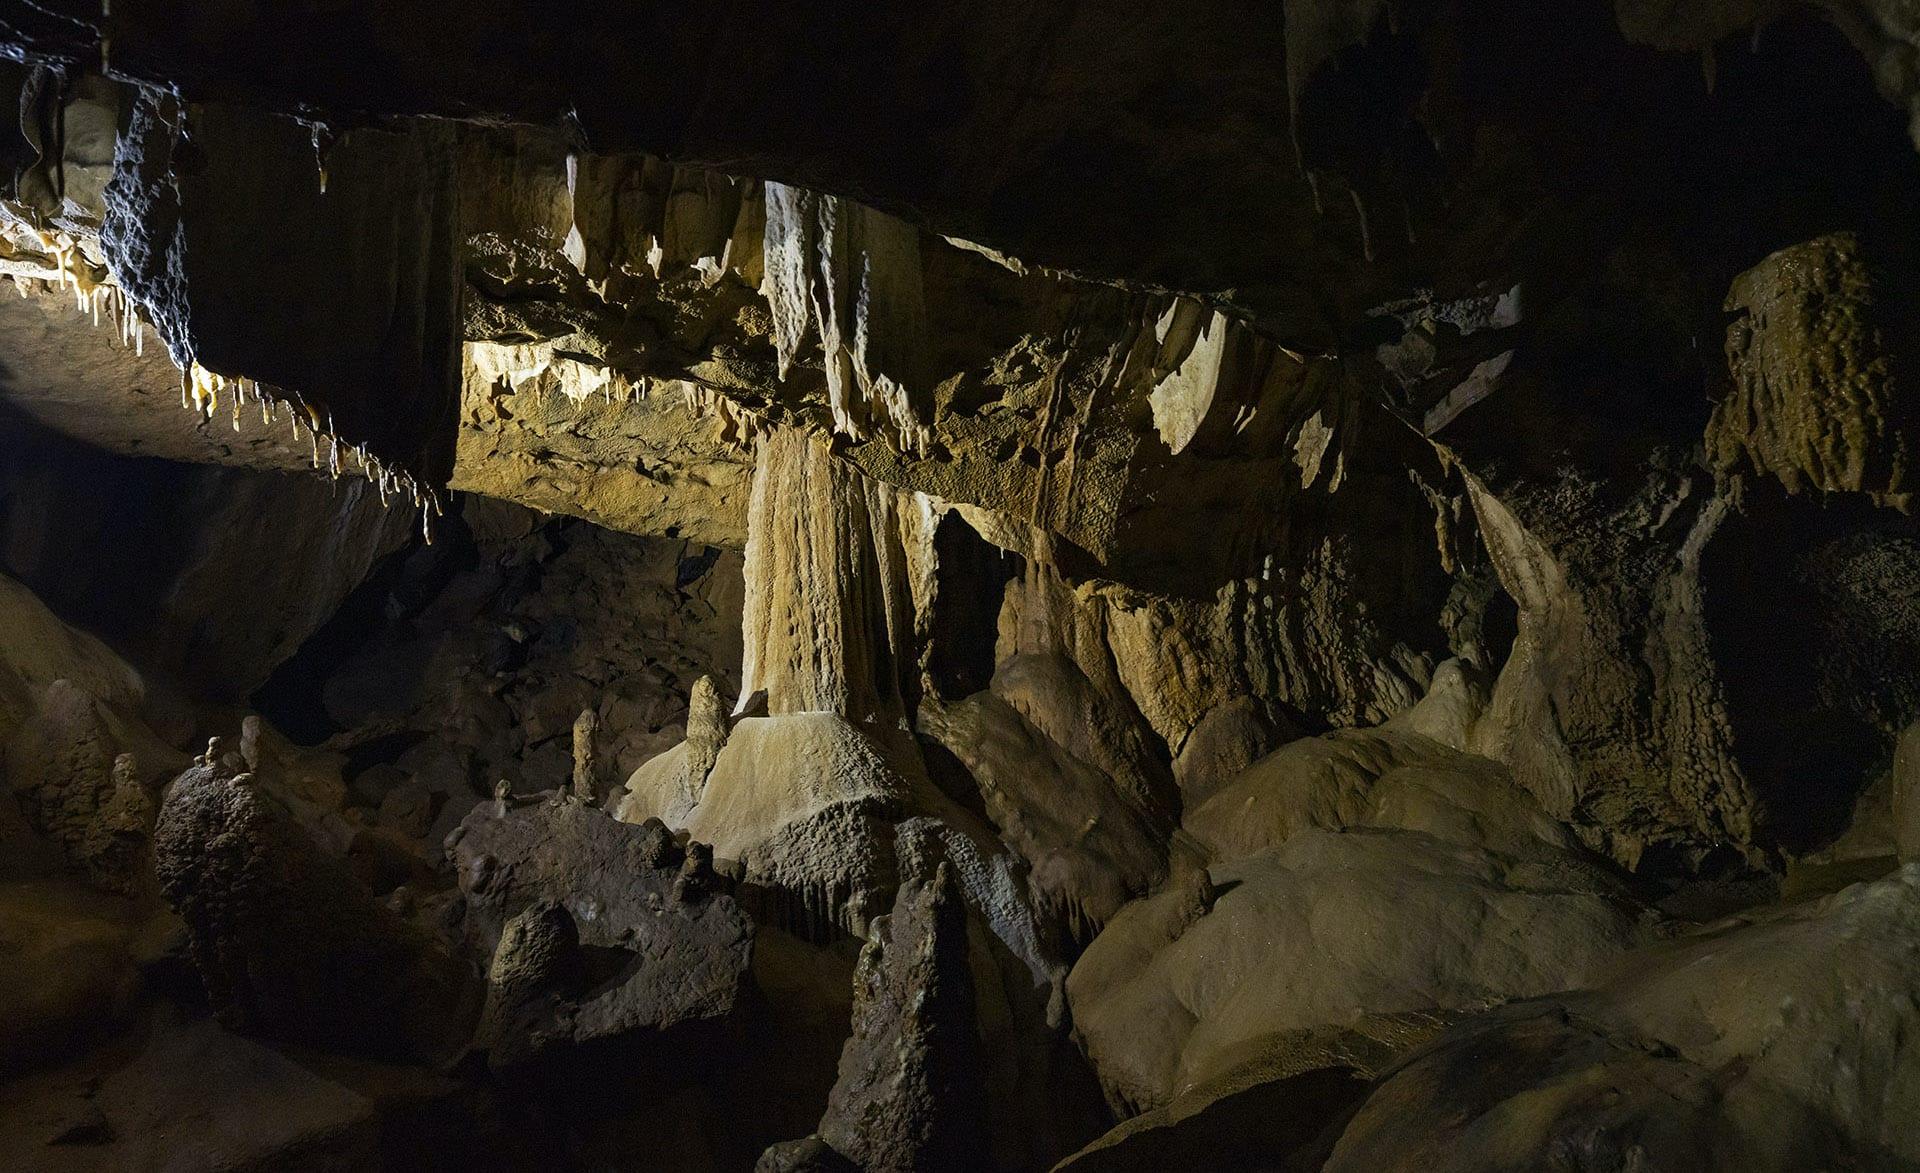 meghalaya-caves-formation-stalagmites-large-pillars